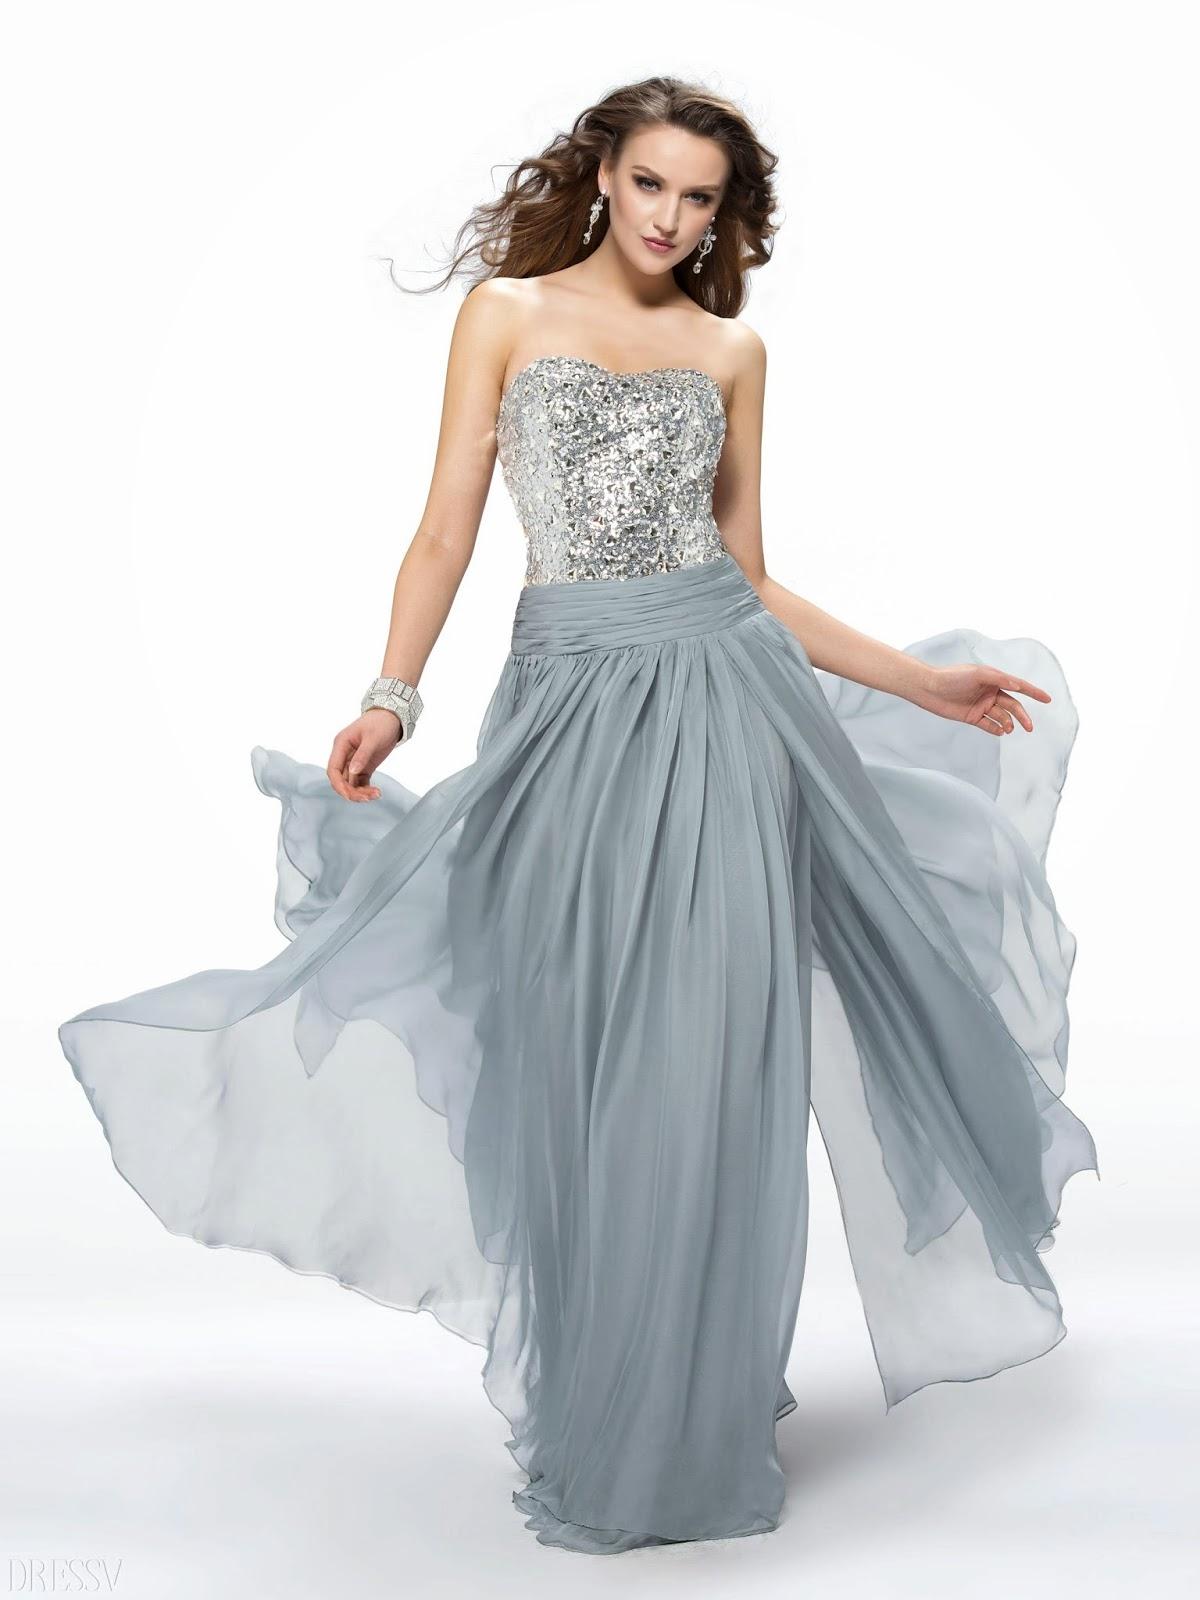 Kaiyo Aino Blog: Dress to Impress: Dressv`s Mermaid Wedding Dresses